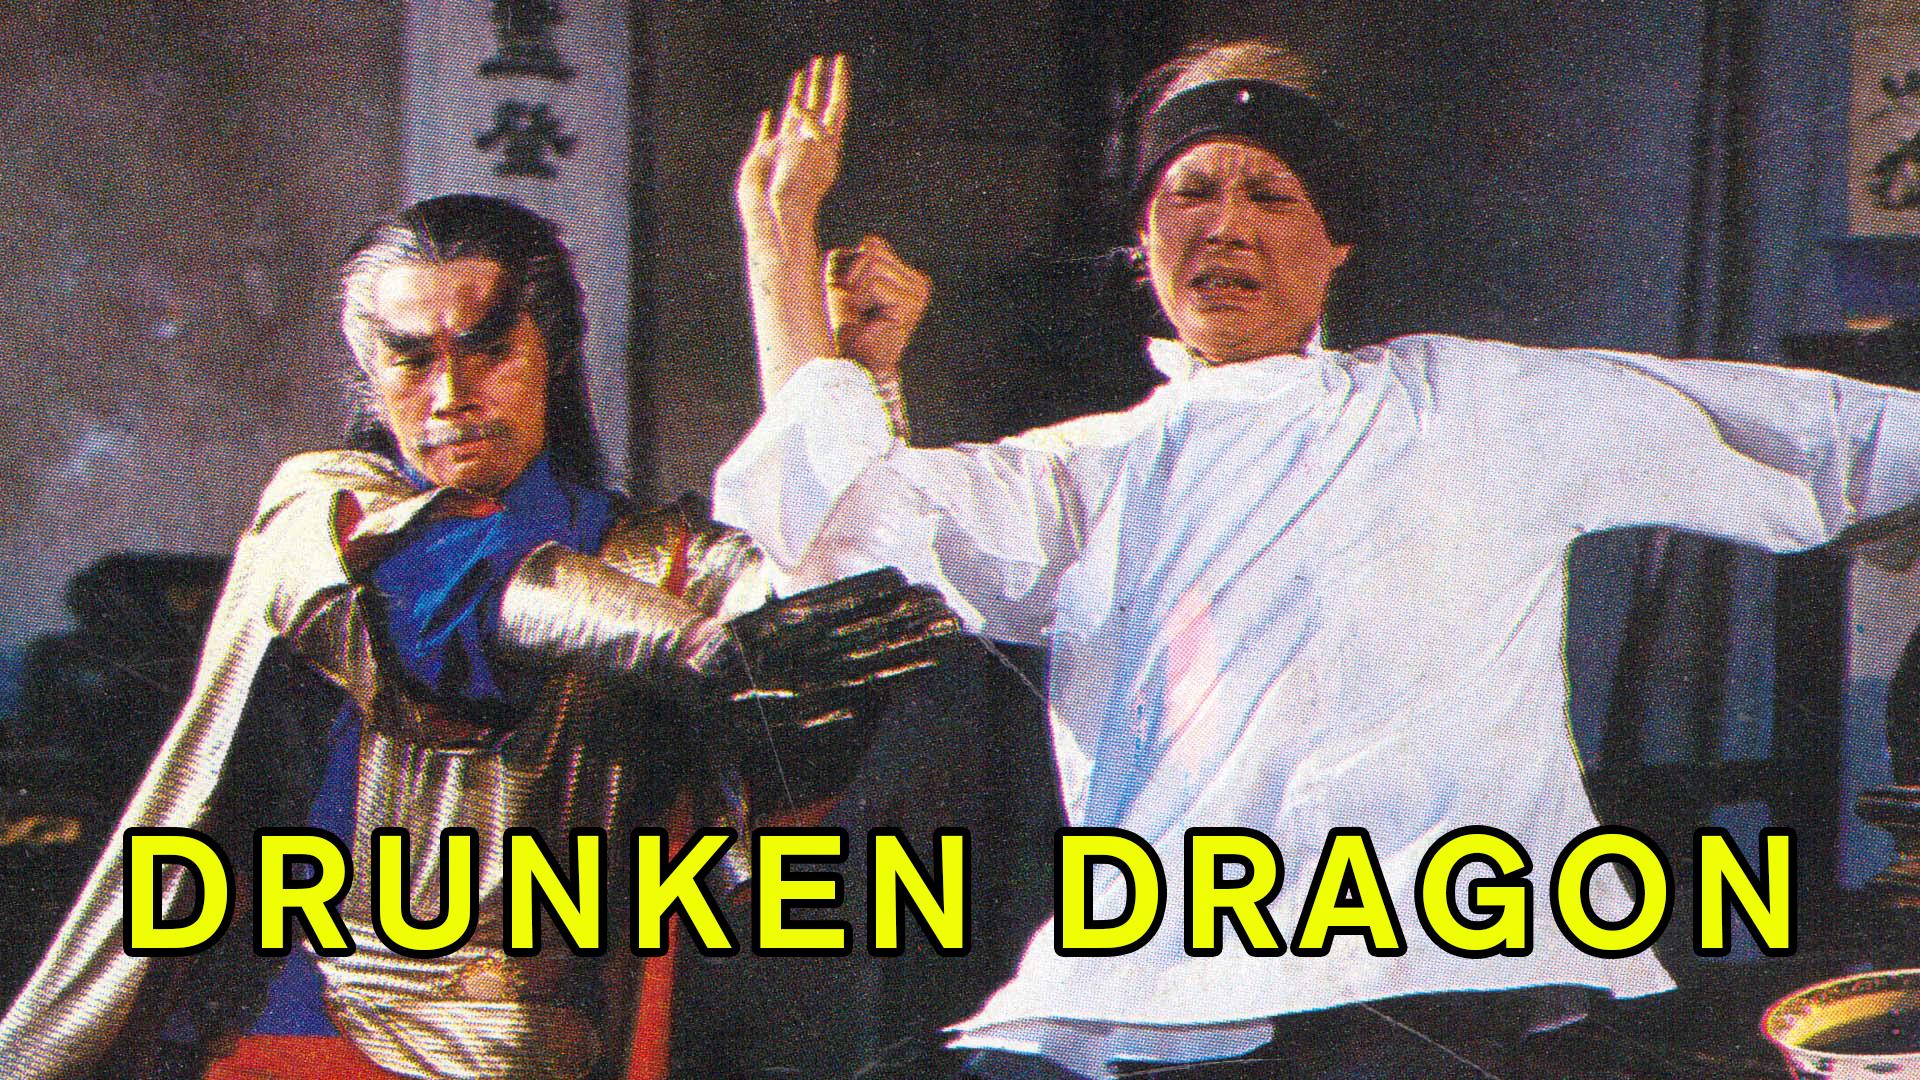 Drunken Dragon